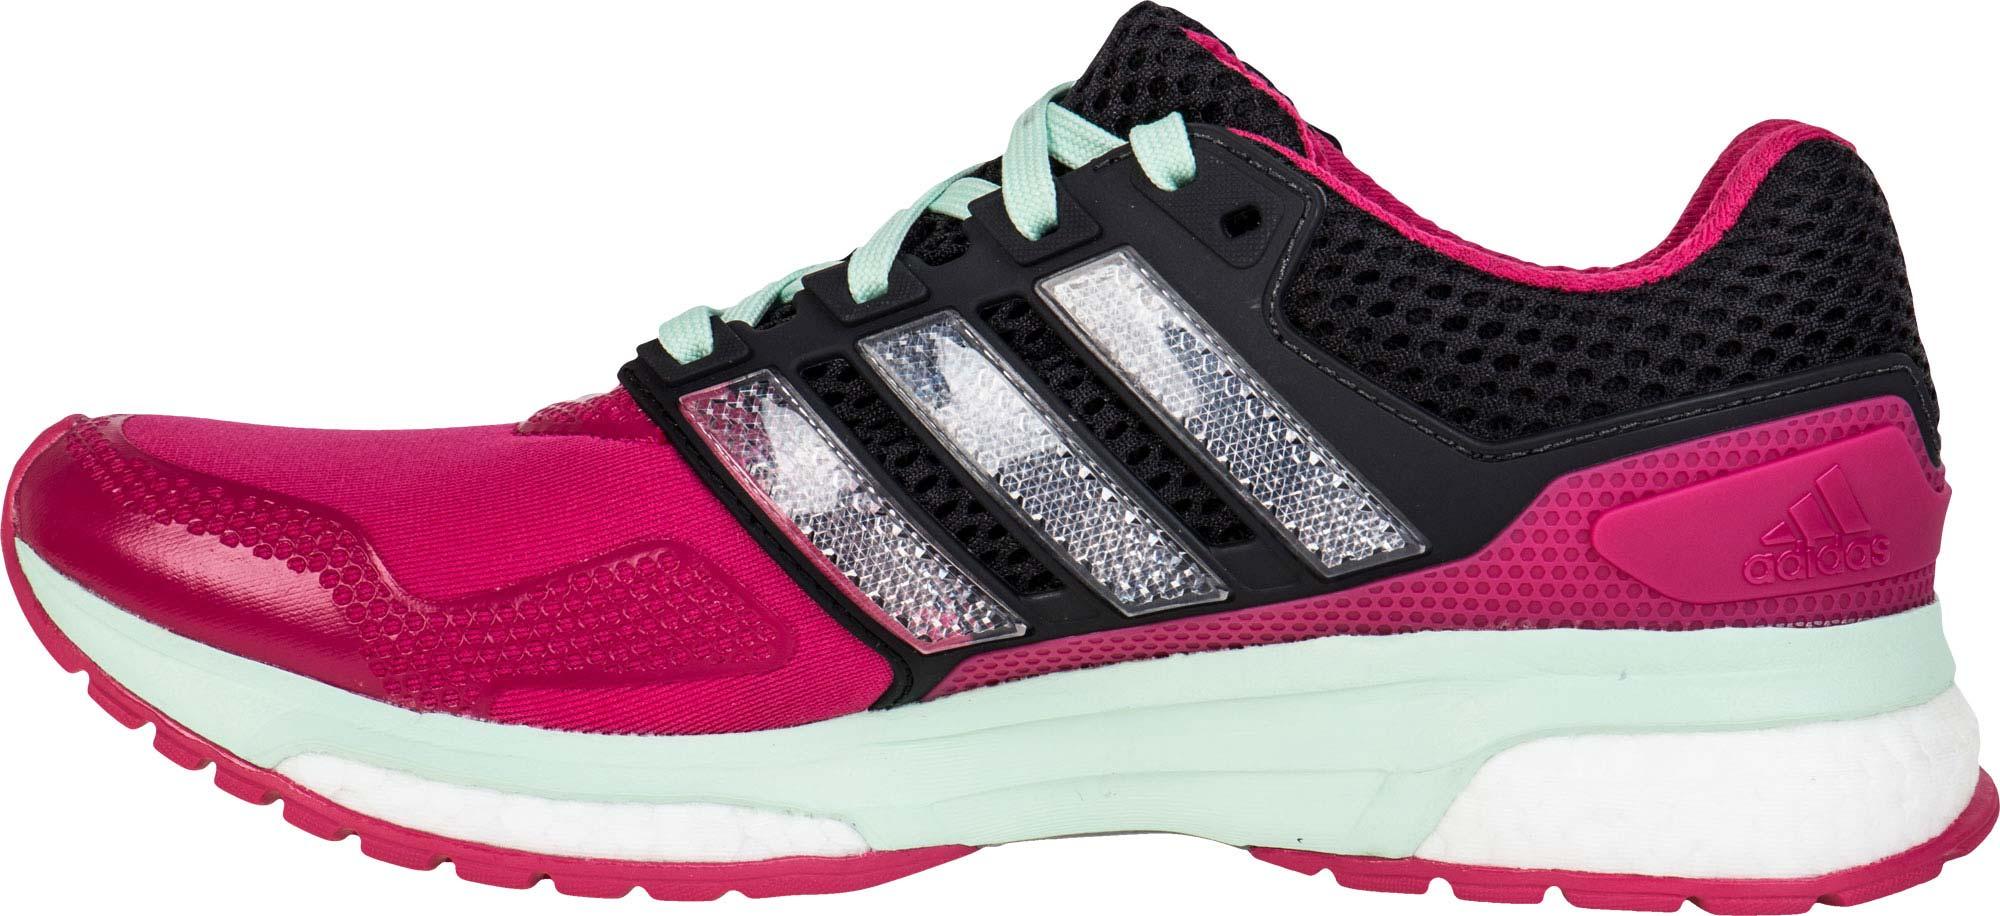 new style da8b9 b07a7 adidas RESPONSE BOOST 2 TECHFIT W. Women s Running Shoes. Women s Running  Shoes